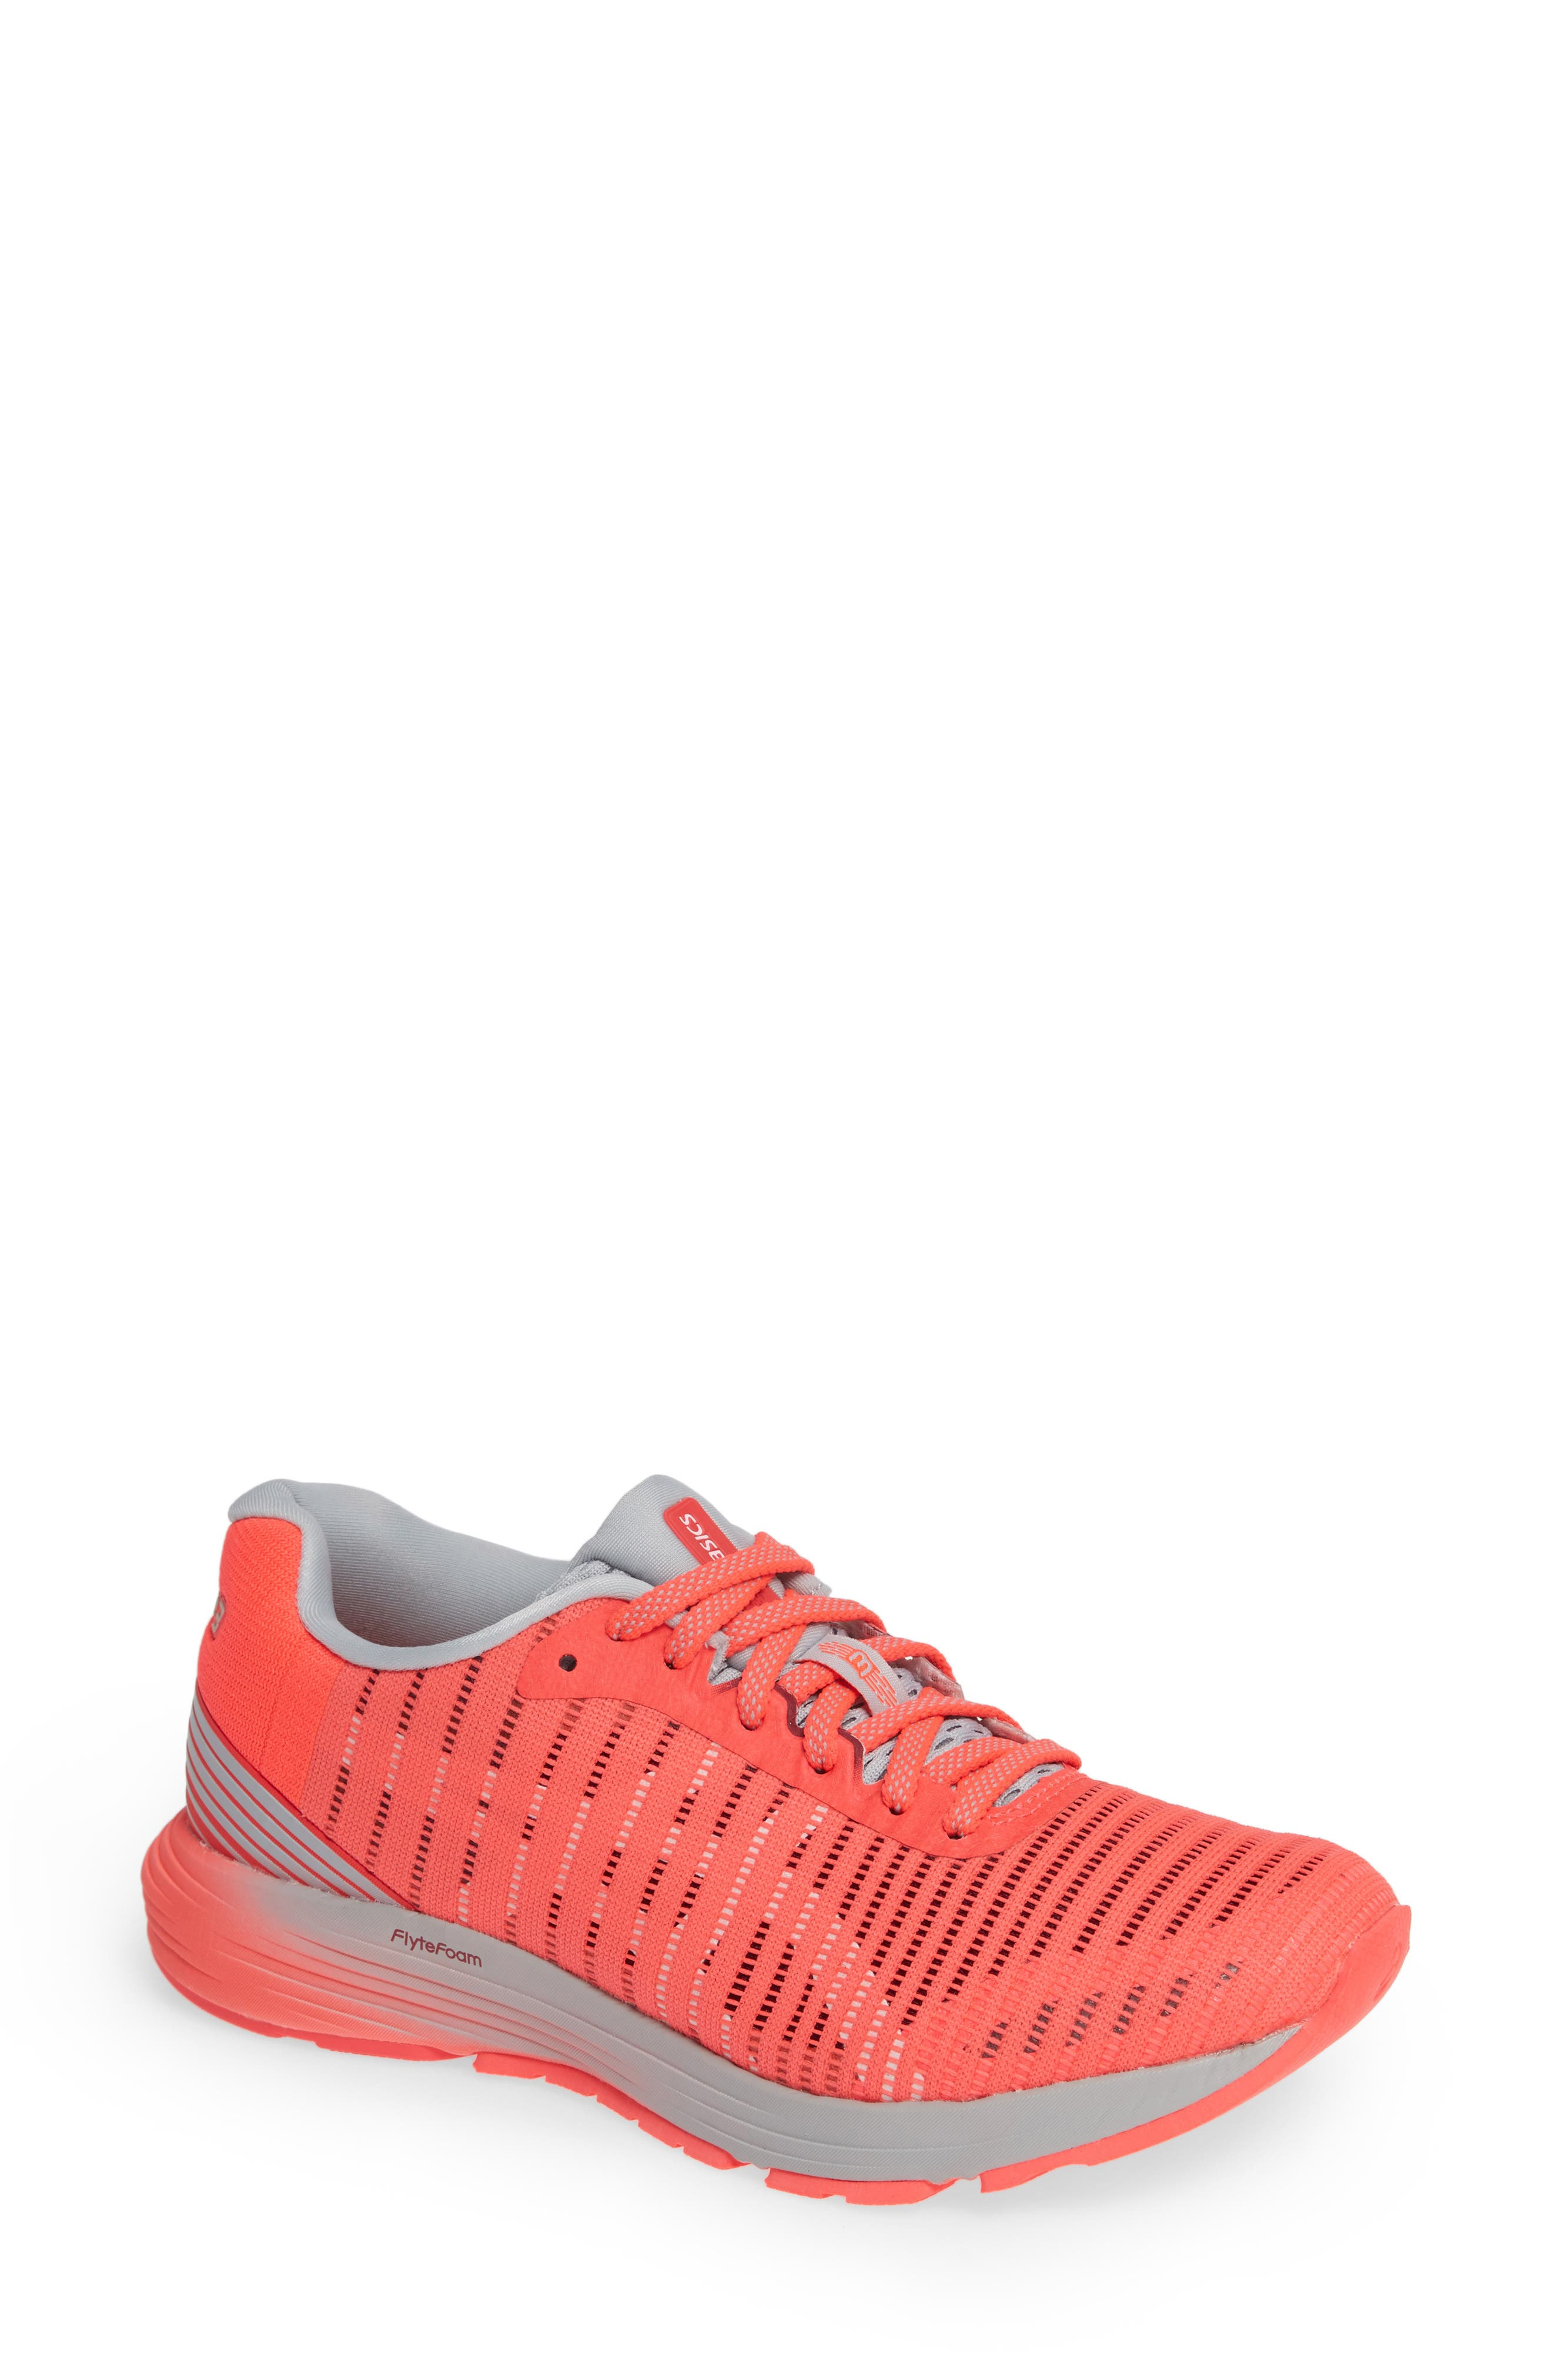 Asics Dynaflyte 3 Running Shoe B - Pink